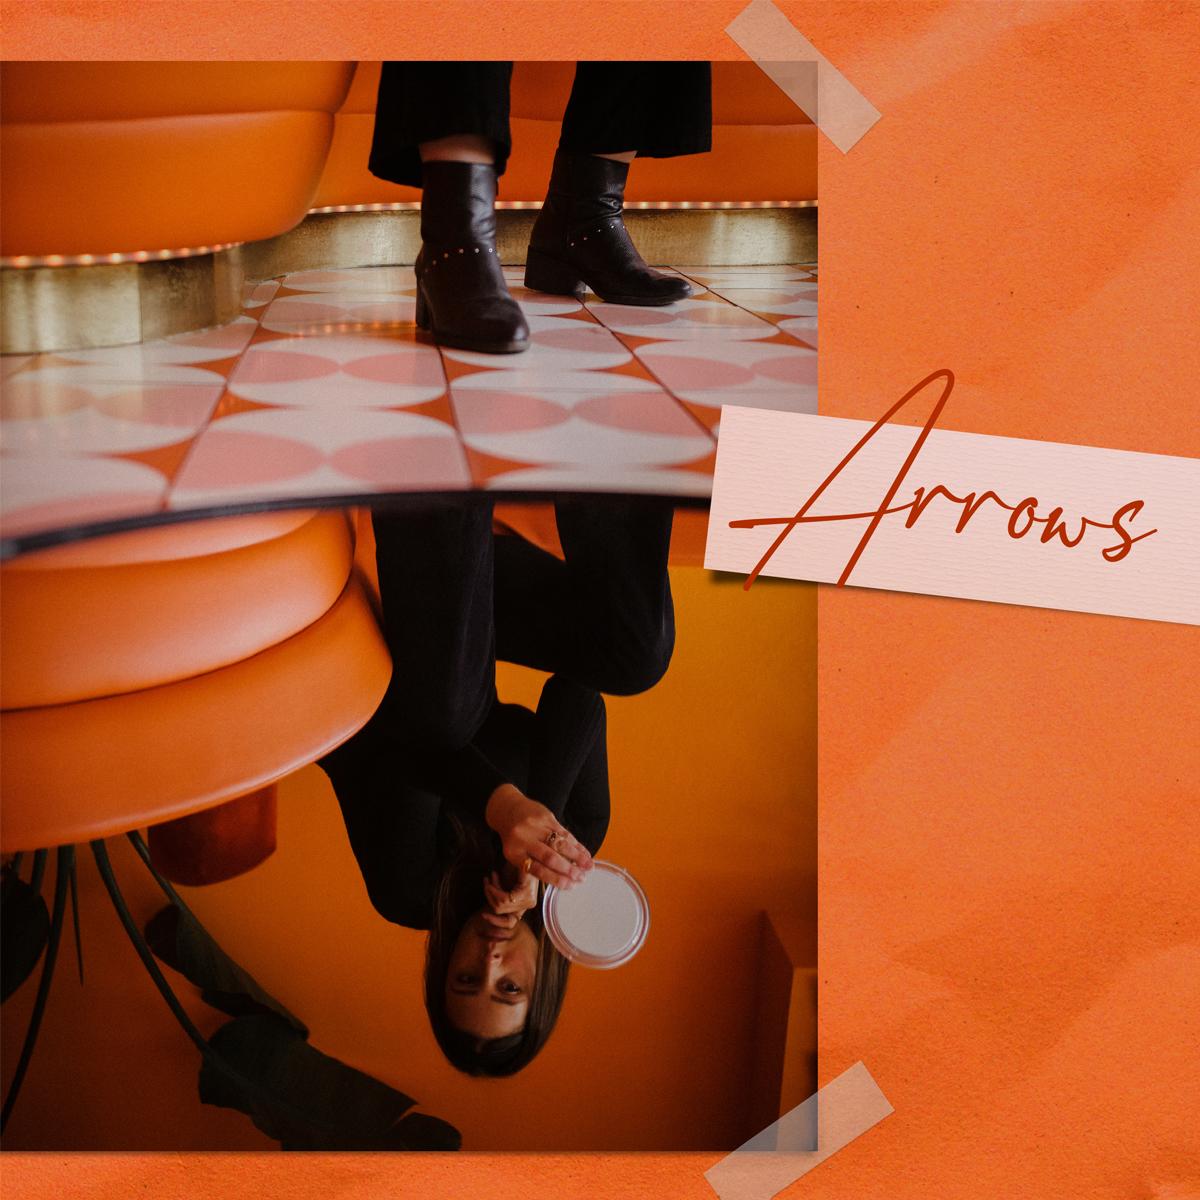 Shannen James Arrows EP review